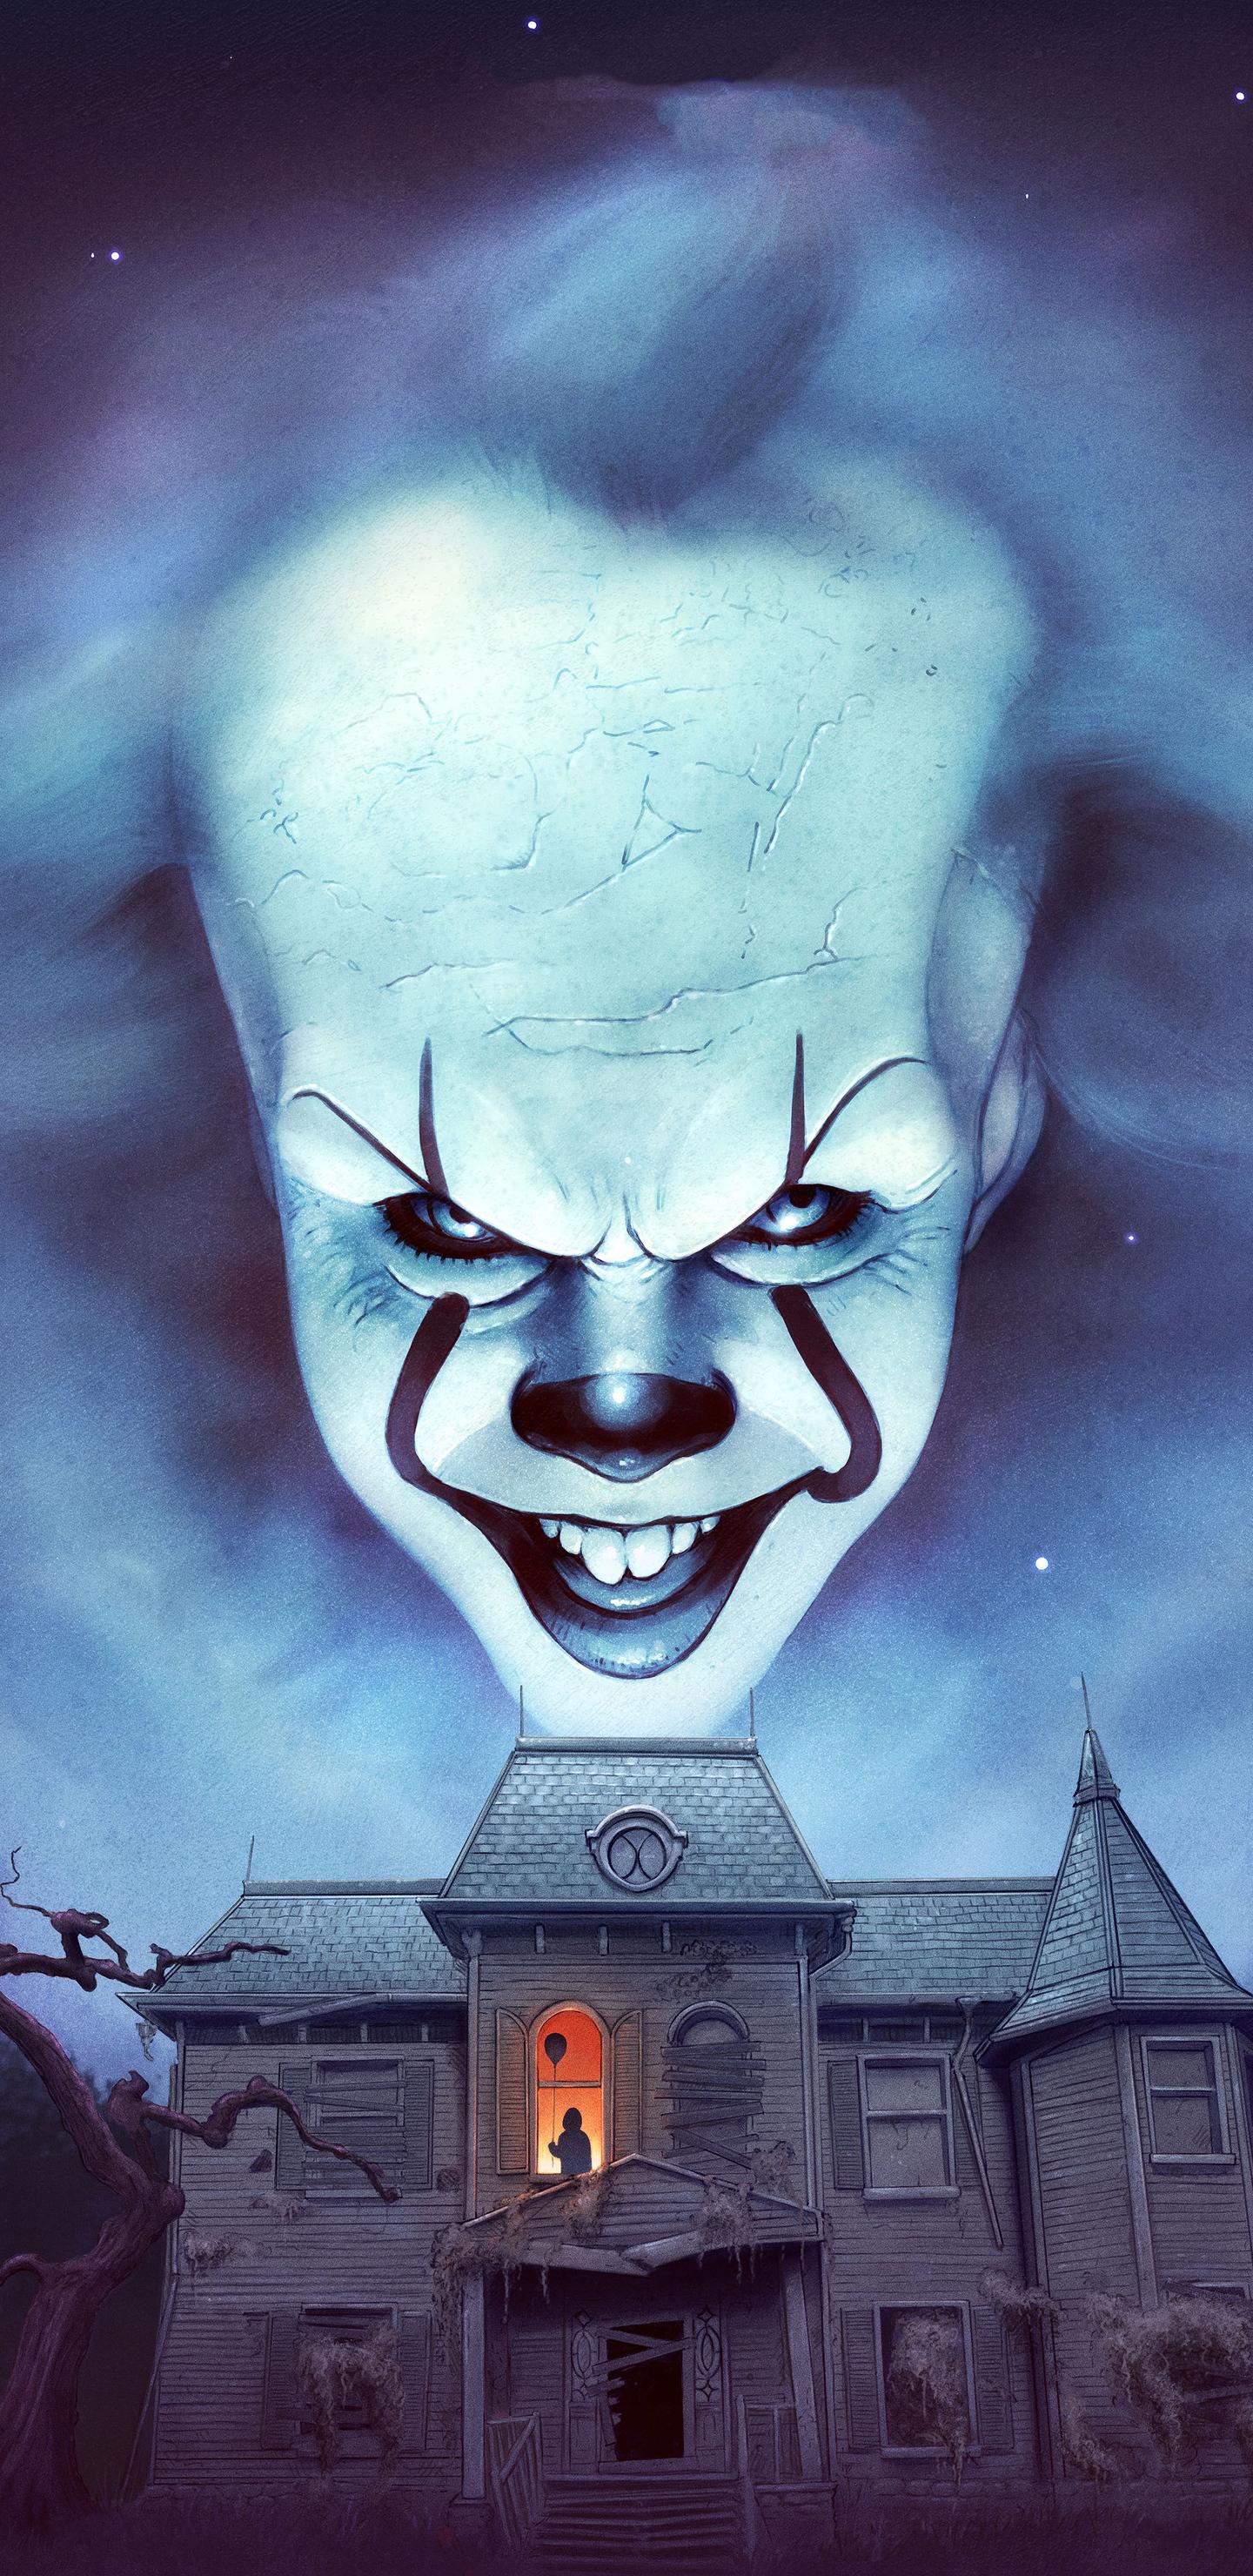 pennywise-the-clown-fanartwork-9a.jpg